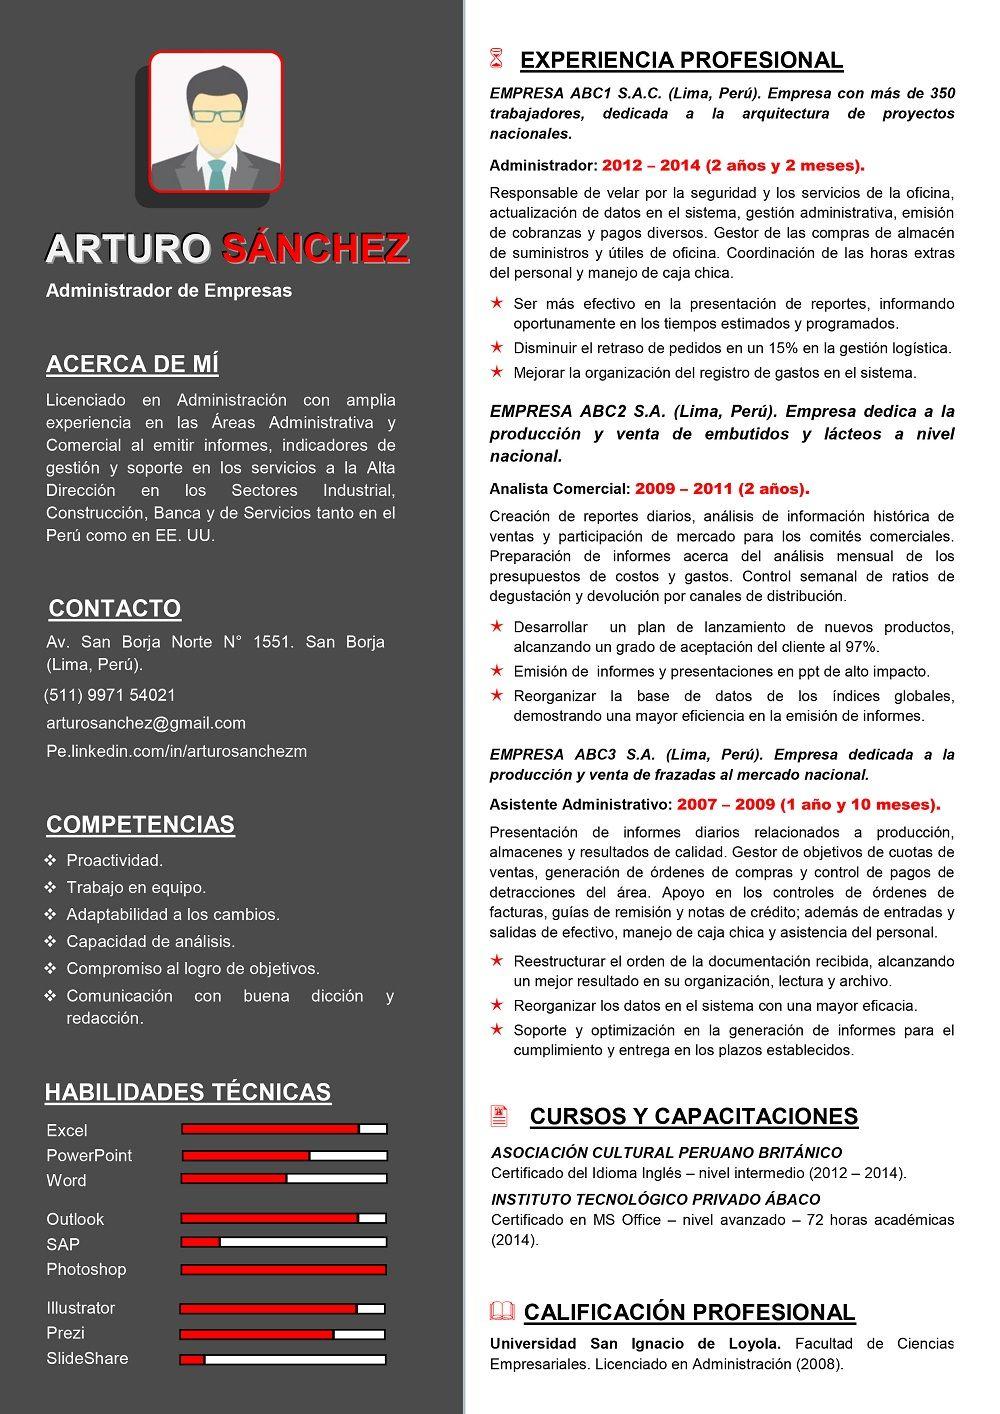 Vistoso Plantilla De Curriculum Vitae De Administración Molde ...